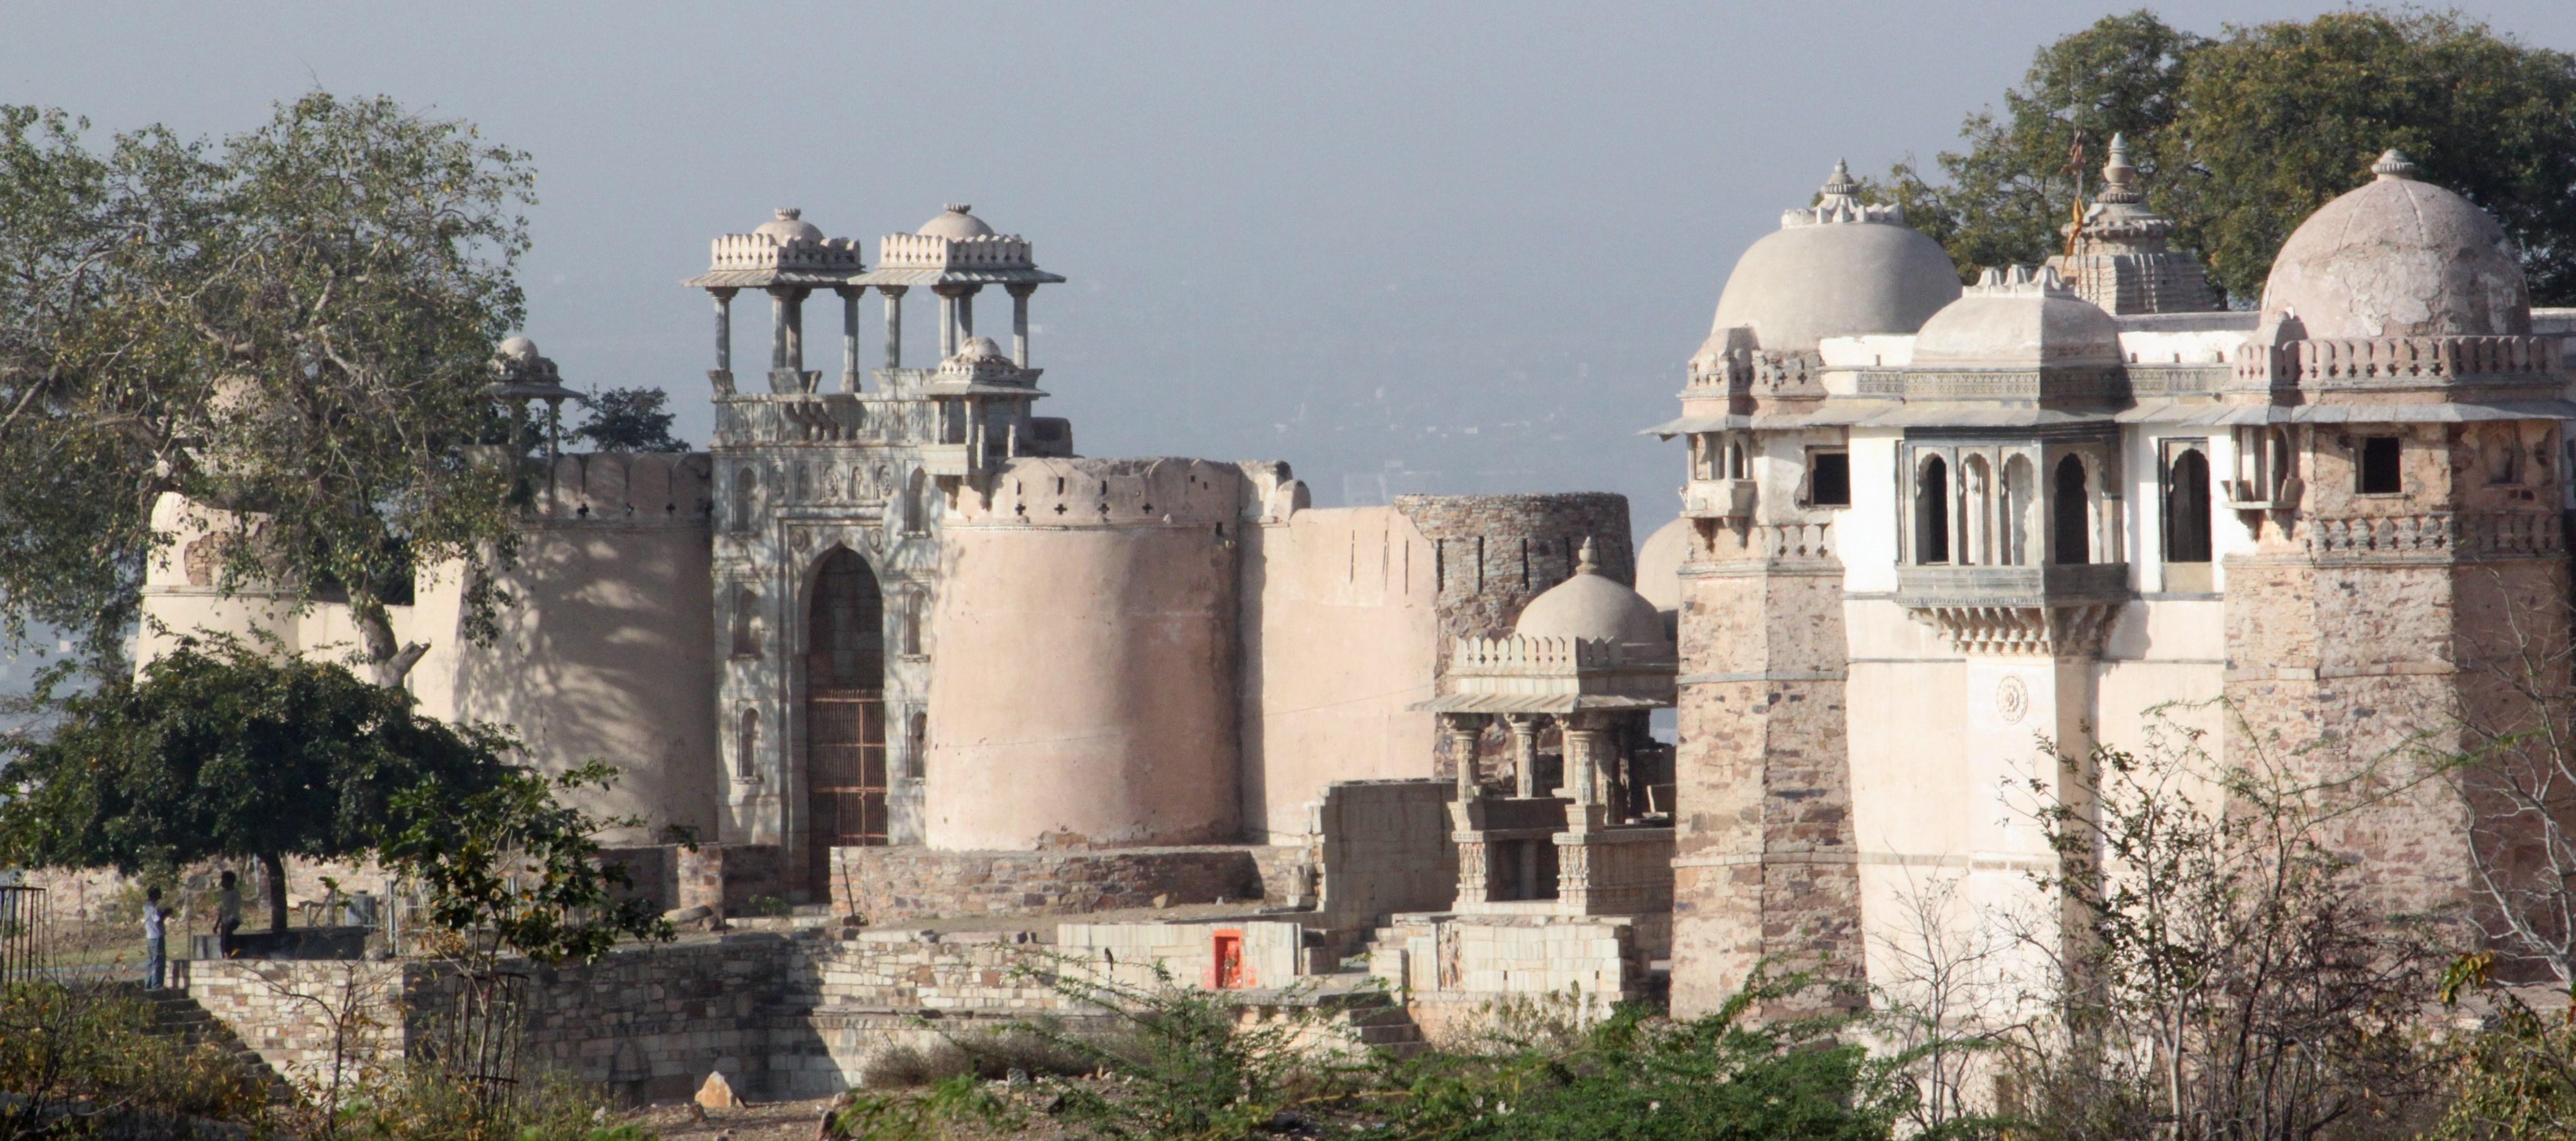 Ratan Singh Palace 9